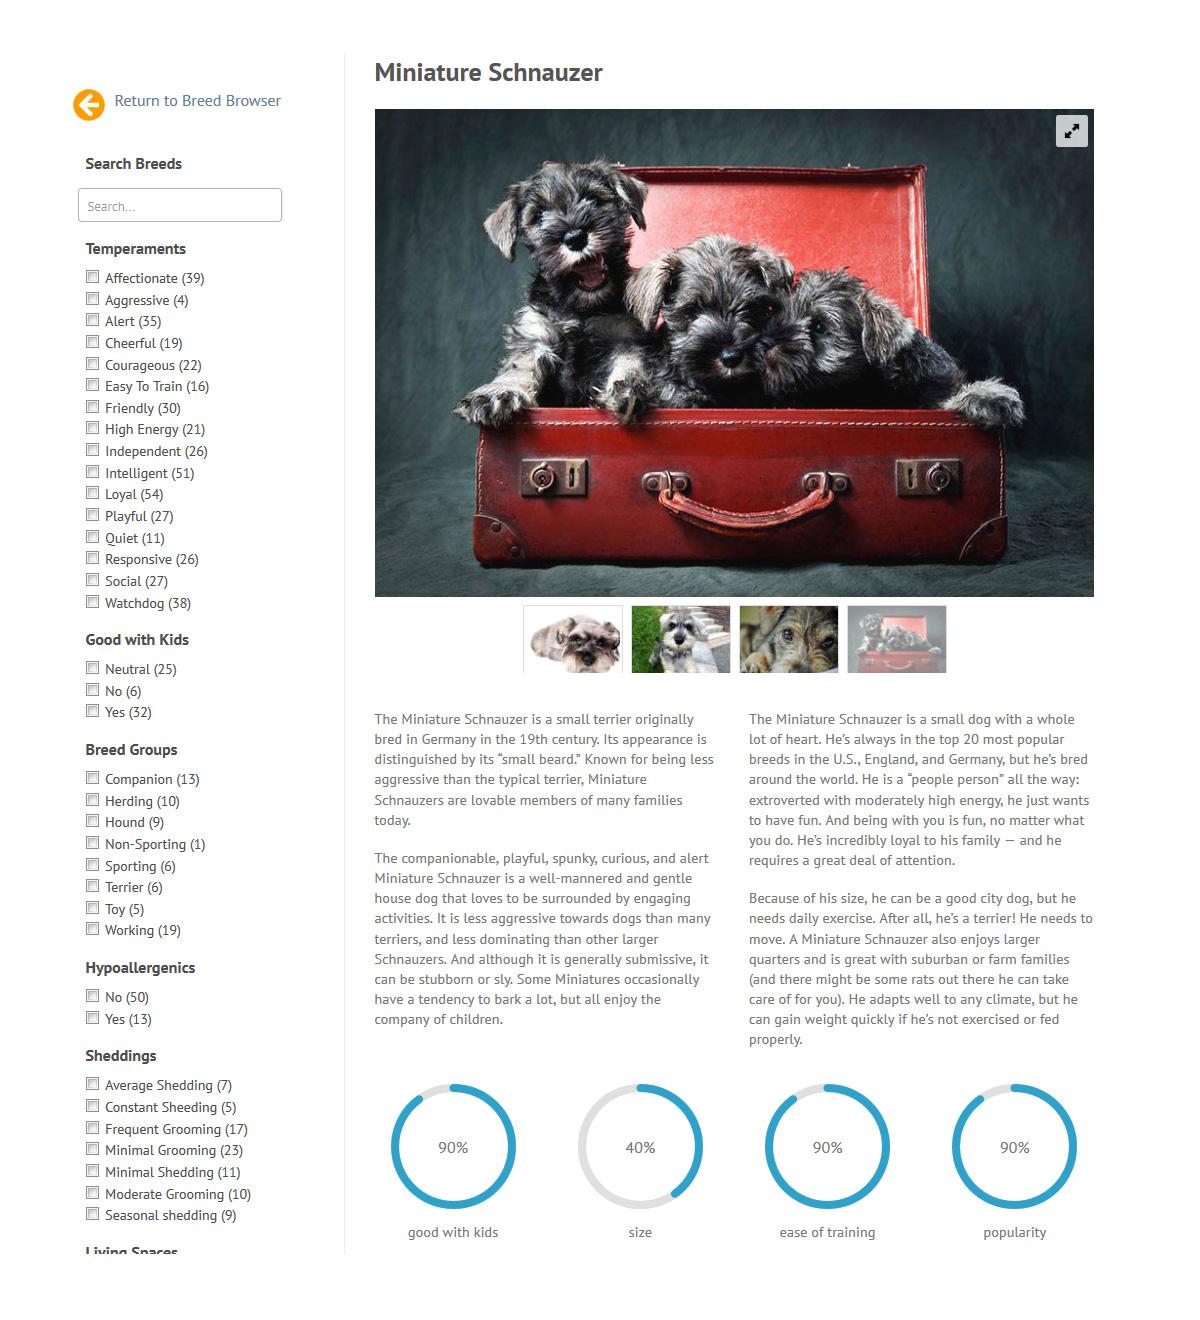 puppies_plus_dogs_mini-schn